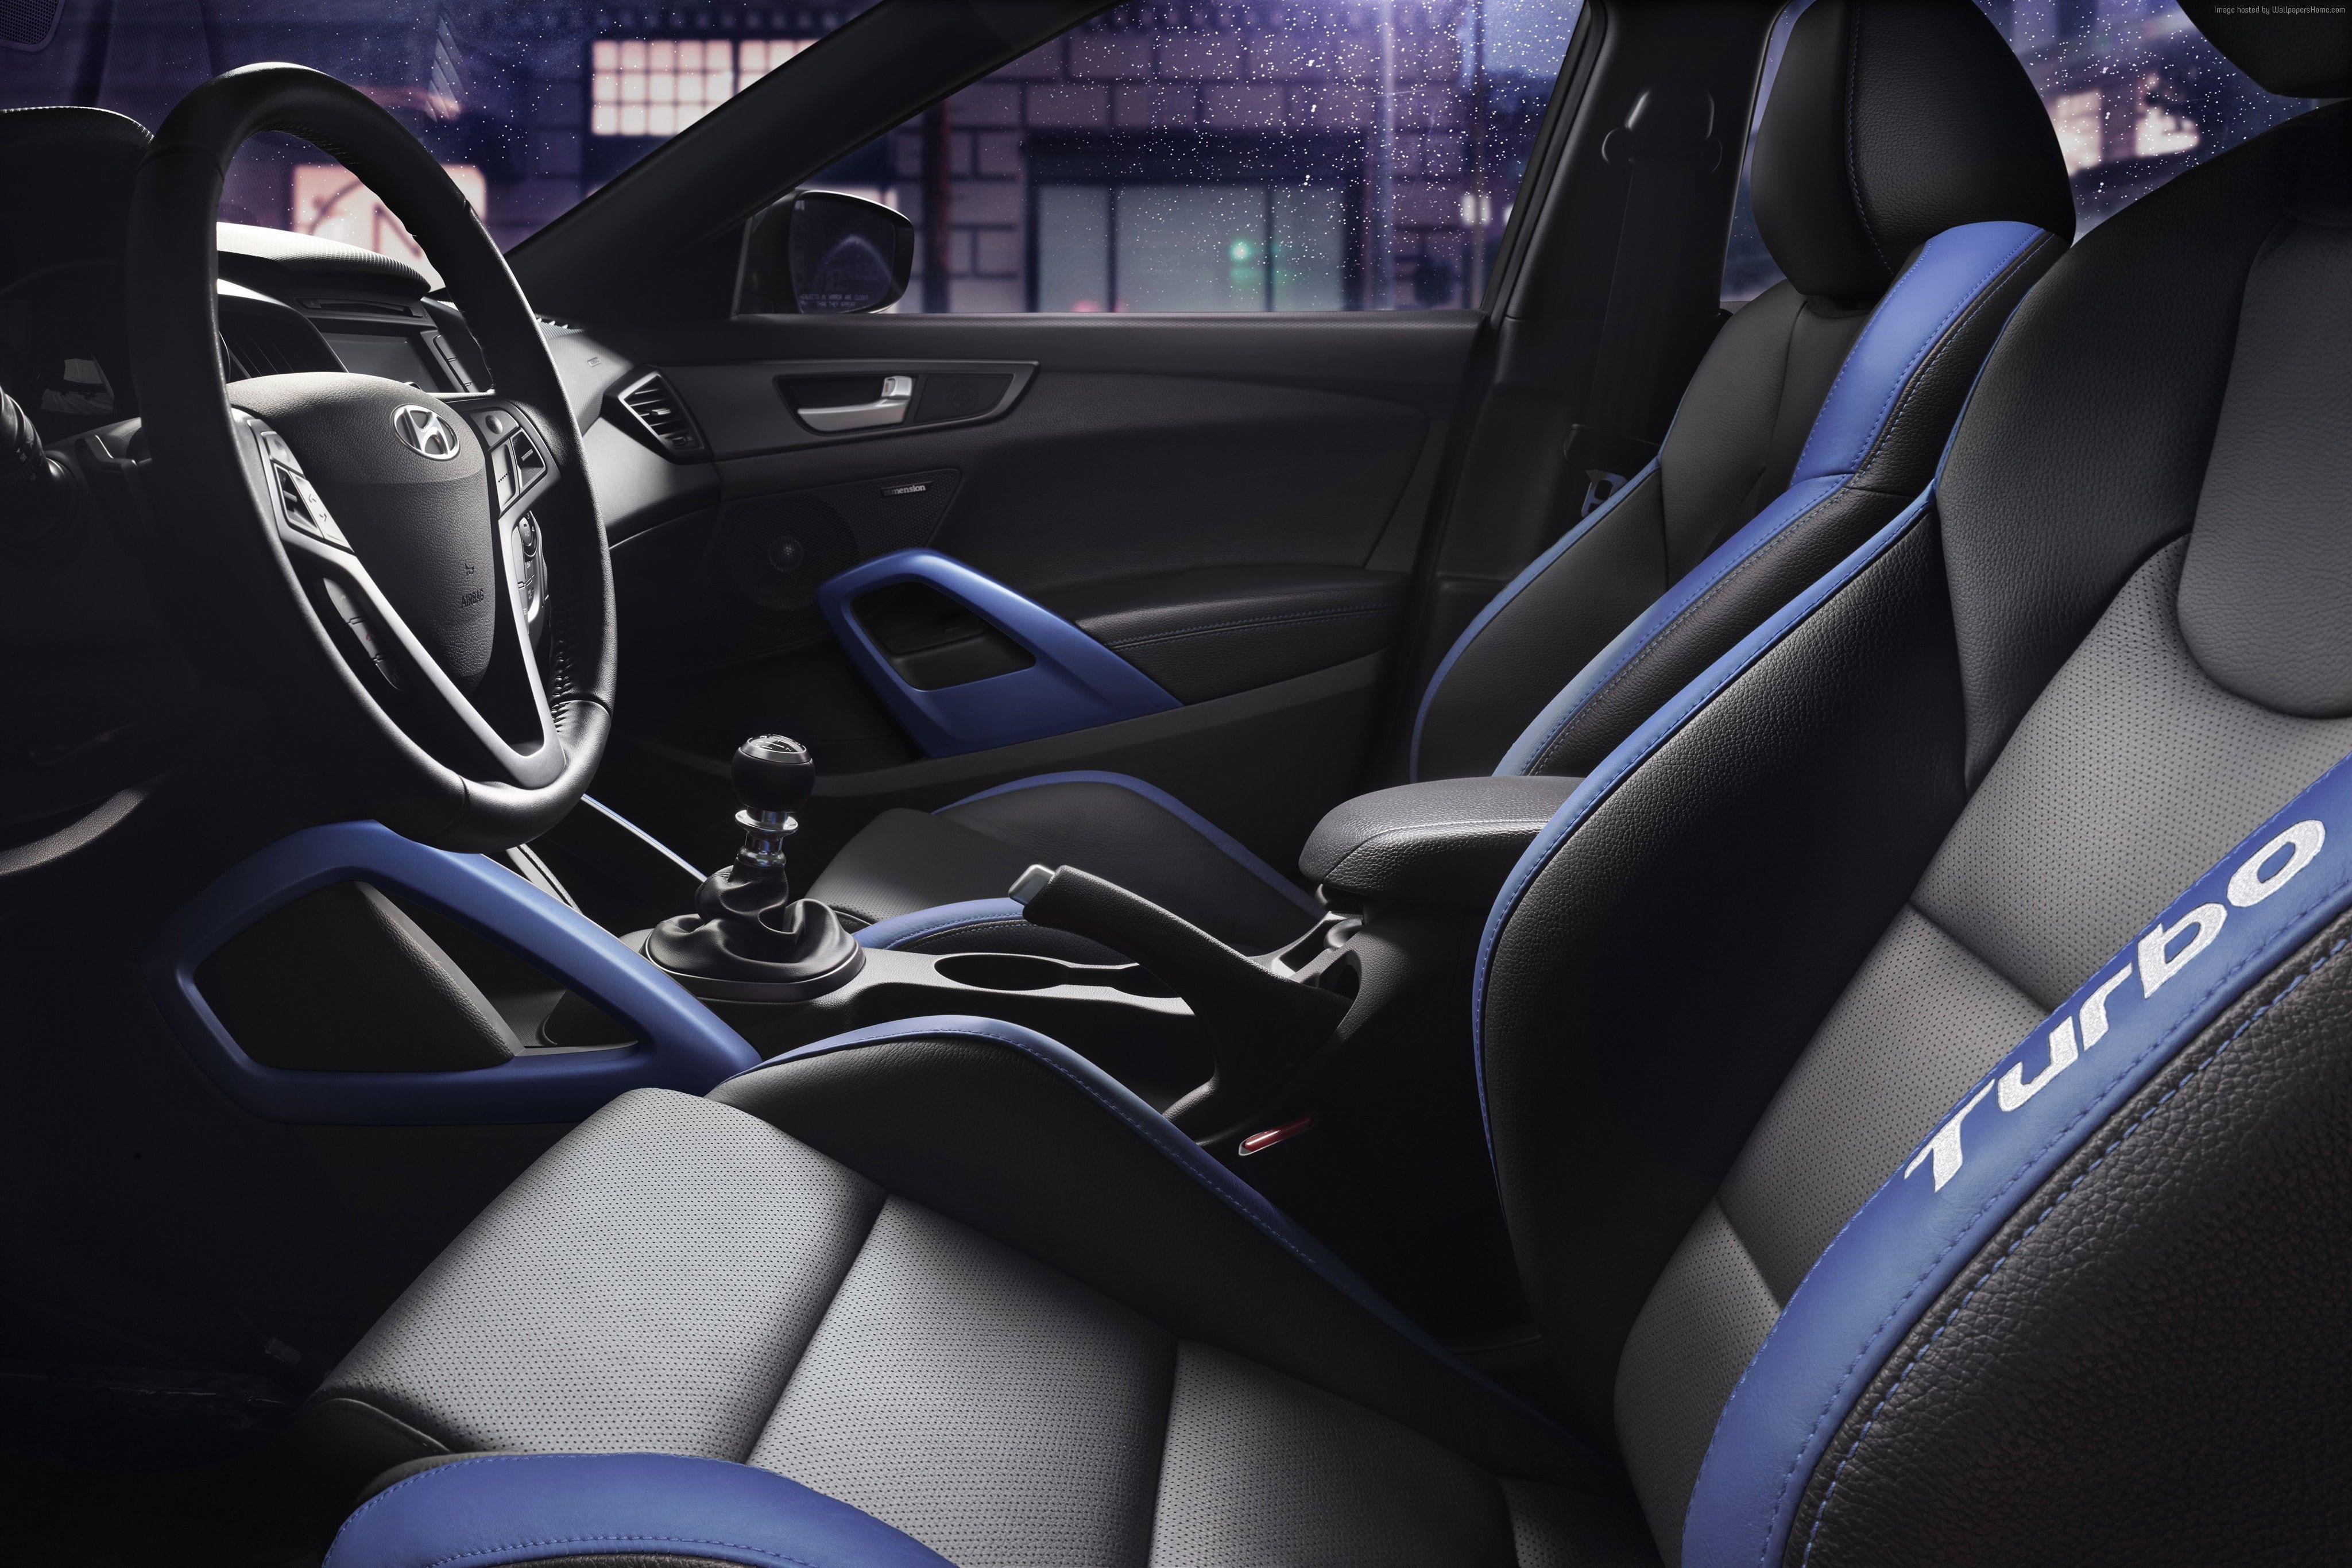 Rally Edition Rally Interior Sports Car Hyundai Hyundai Veloster 4k Wallpaper Hdwallpaper Desktop Ohnisko